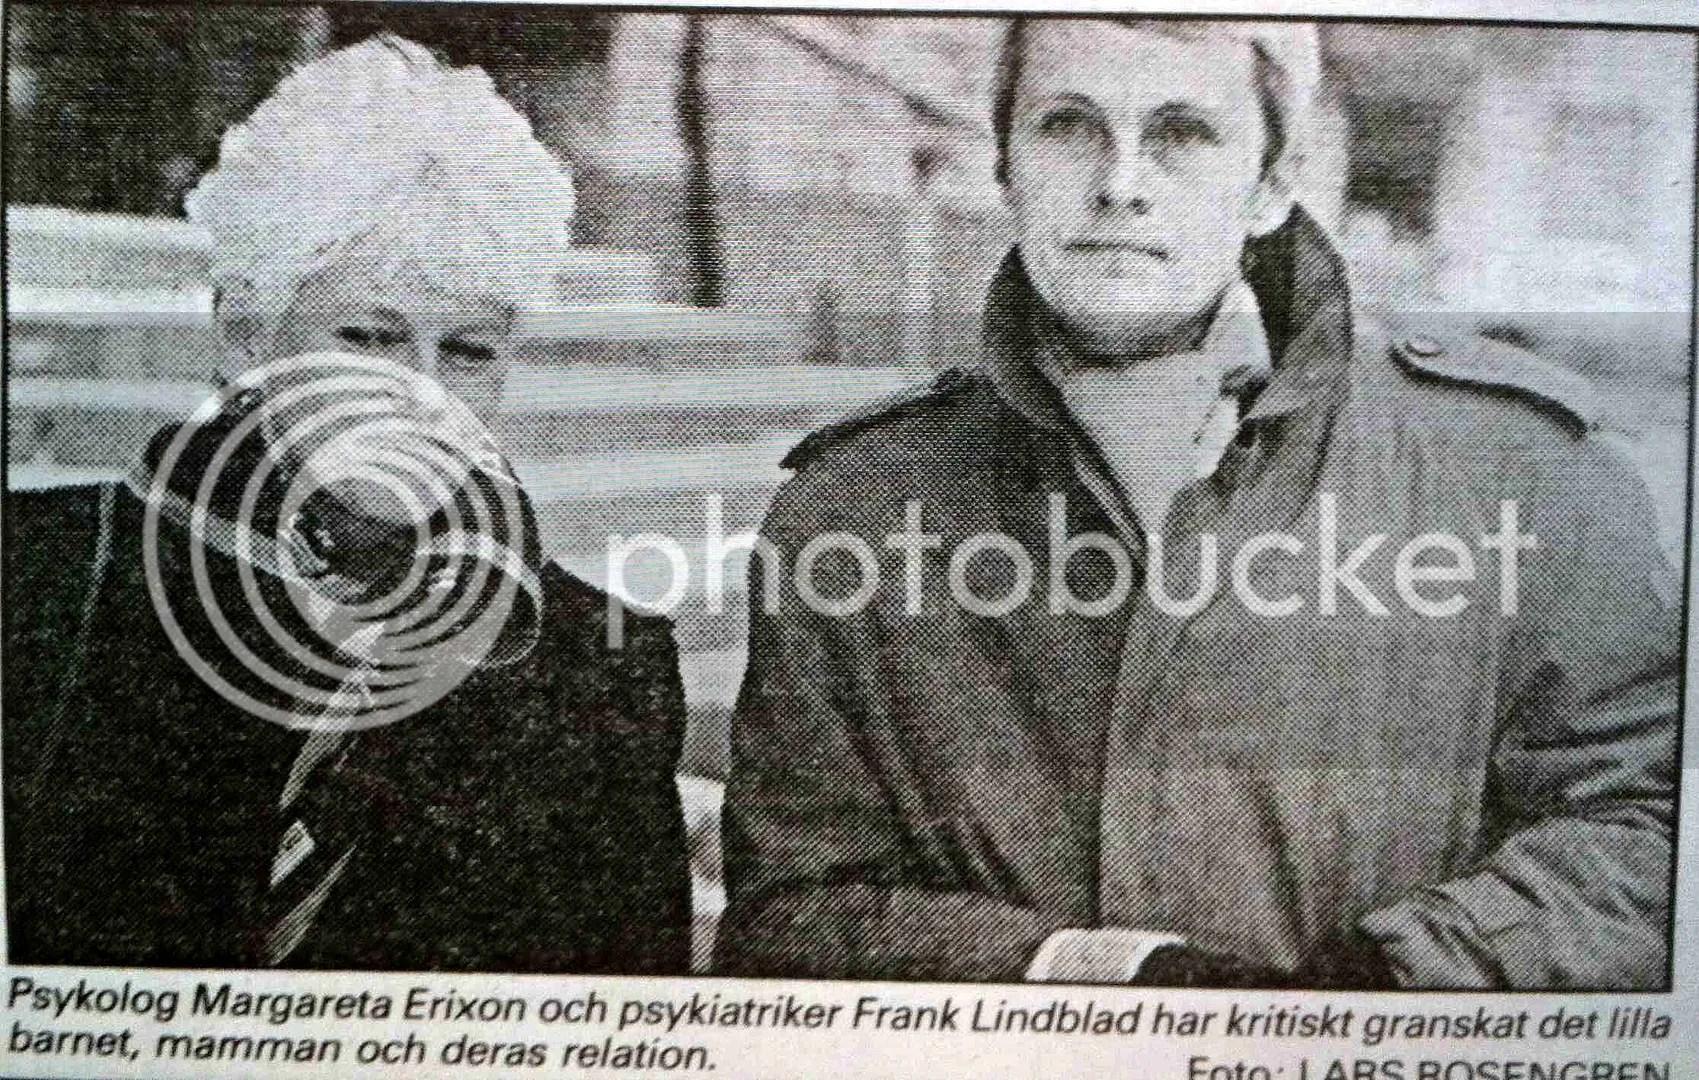 Margareta Erixon & Frank Lindblad 1988 photo MargaretaErixon_zps372e446a.jpg